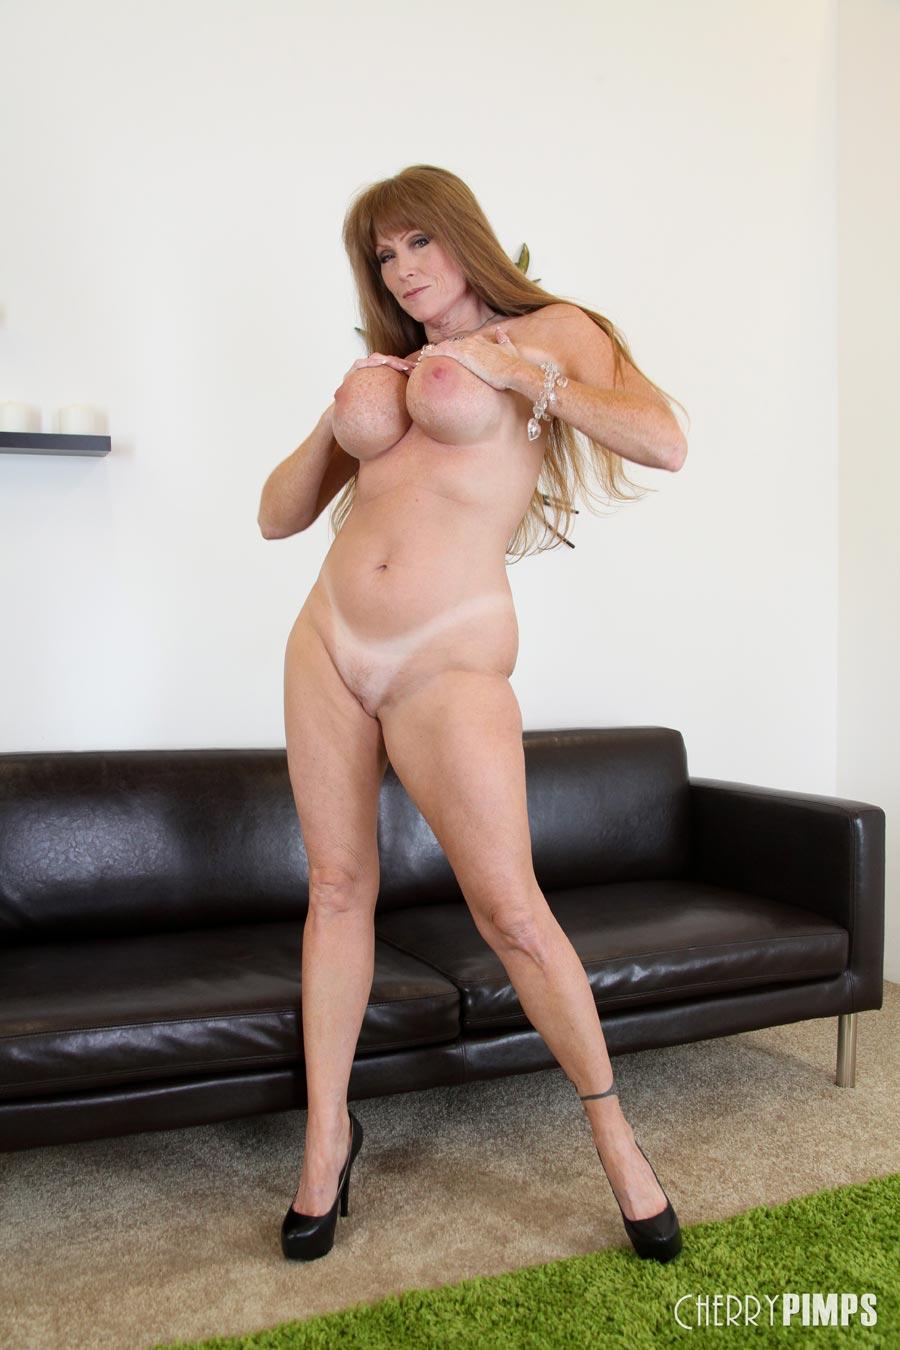 Crane porn star darla